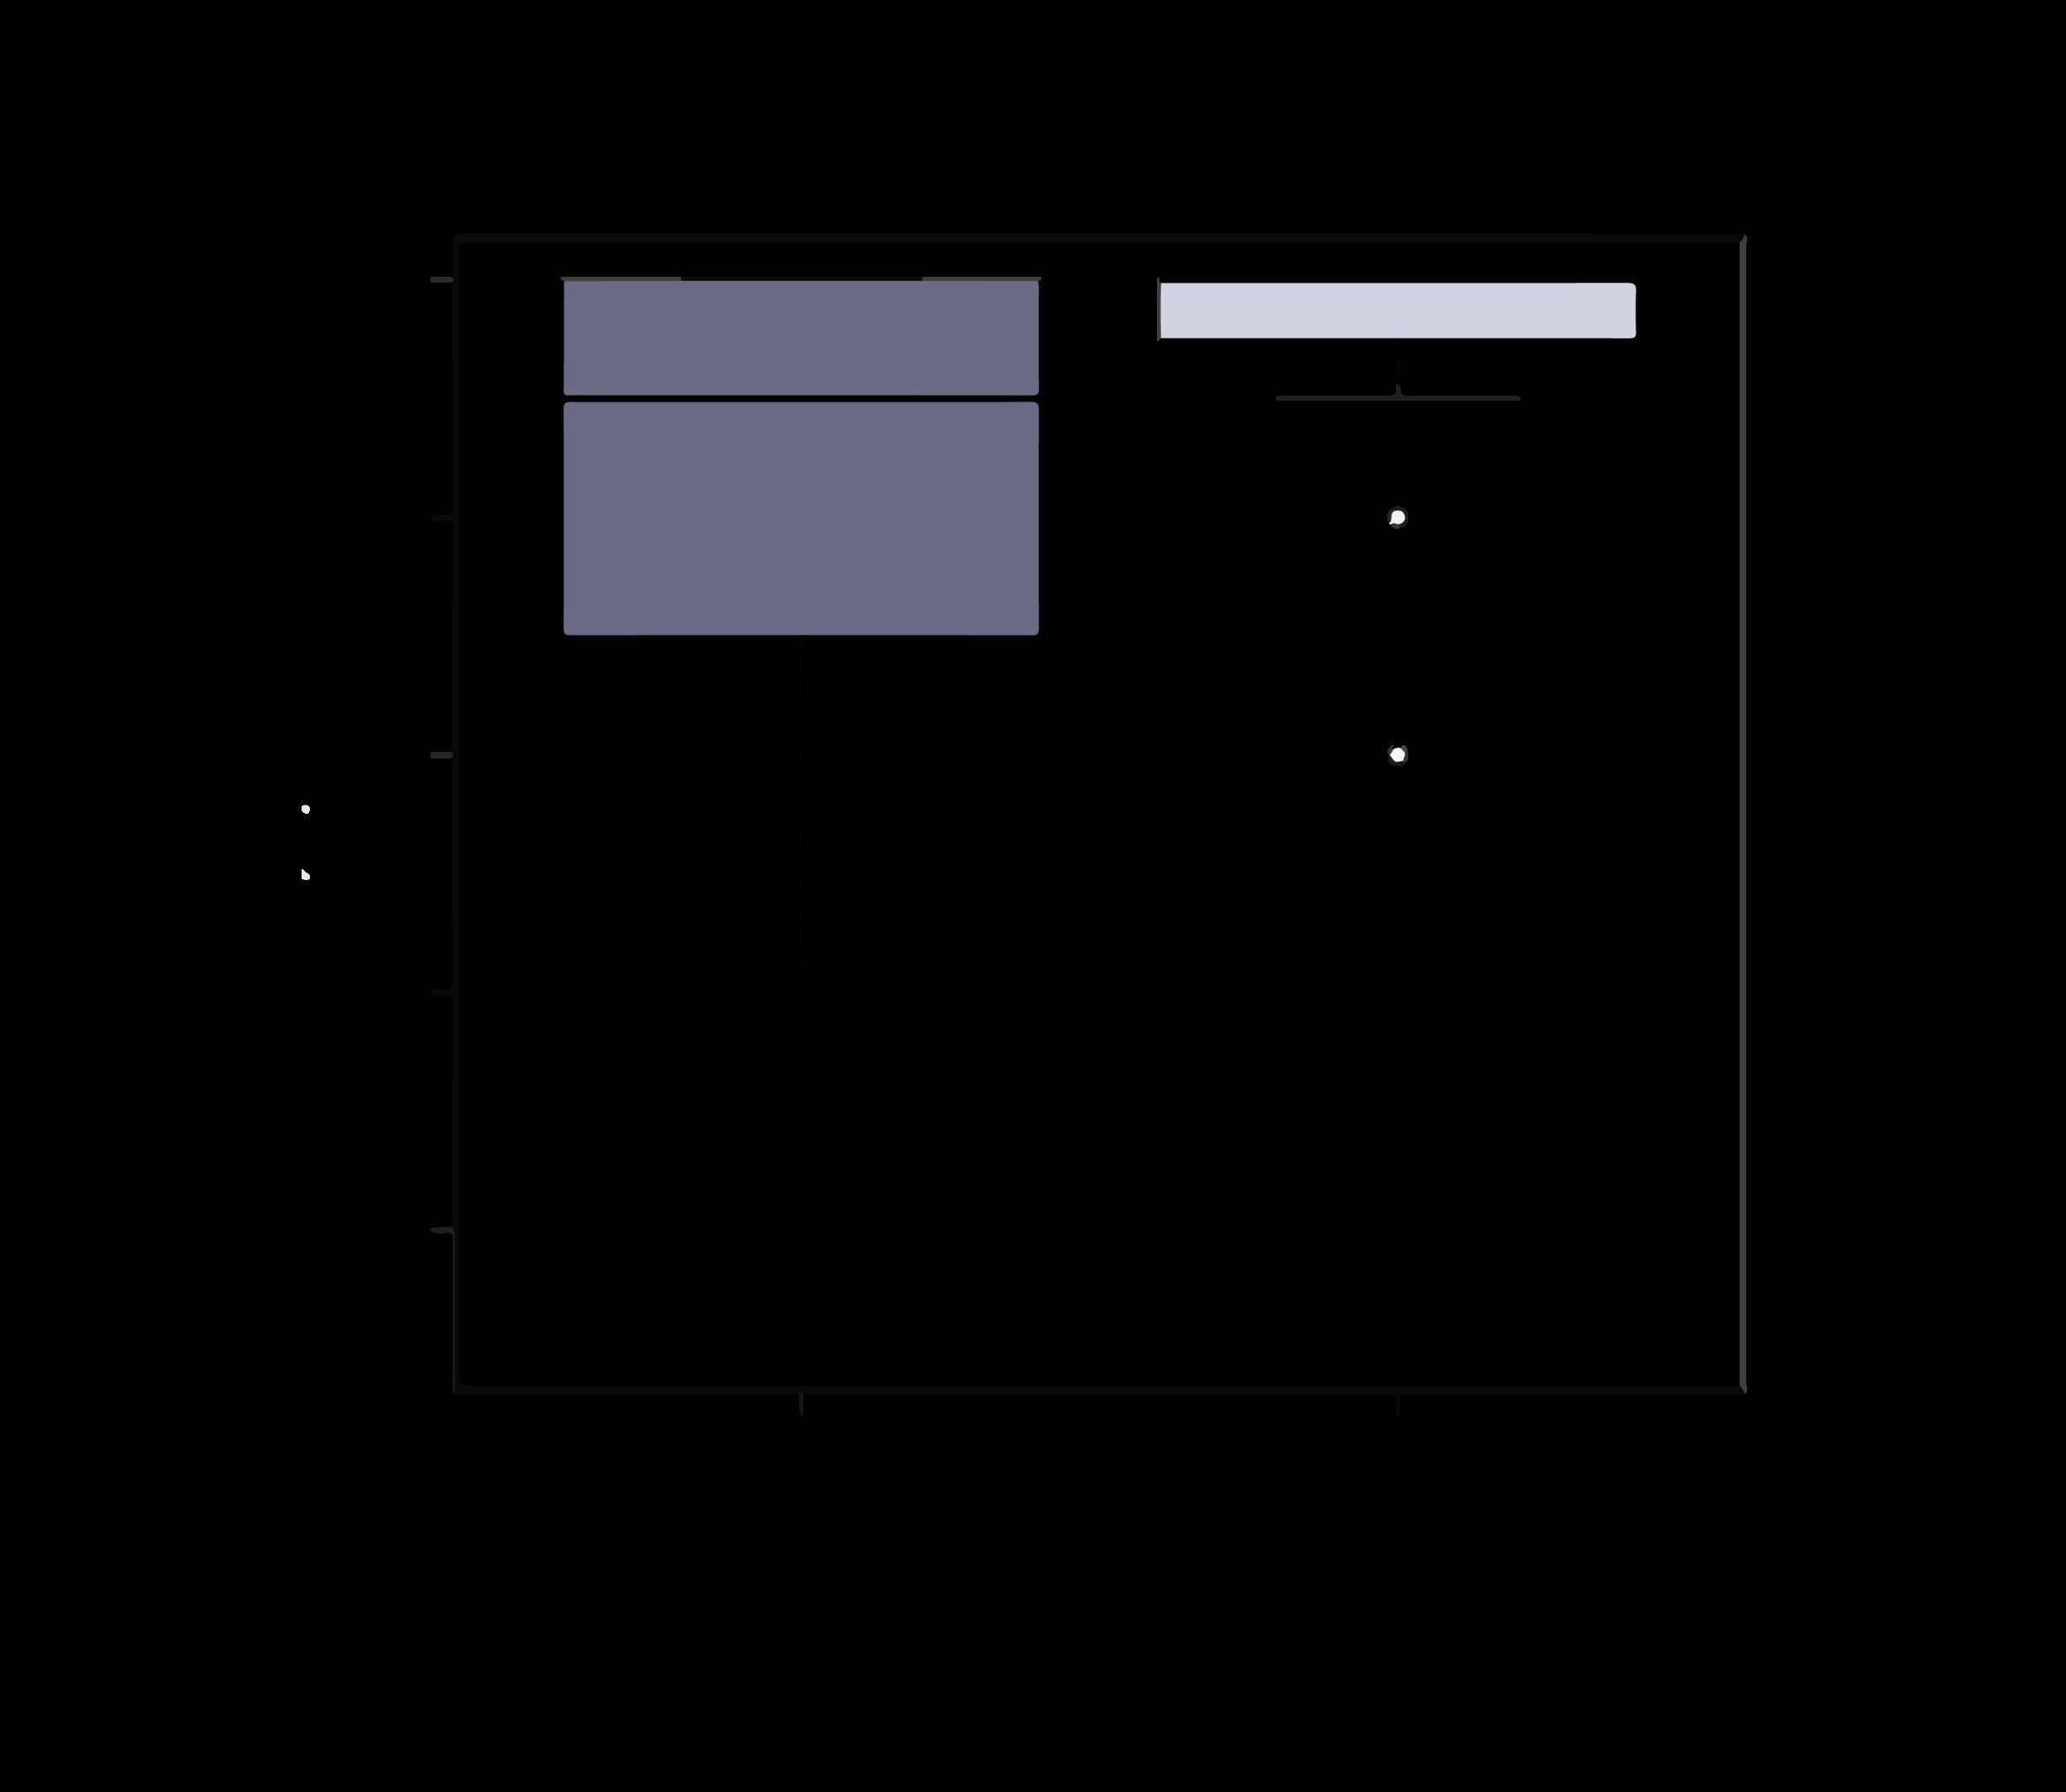 graphArtboard 2@4x.png